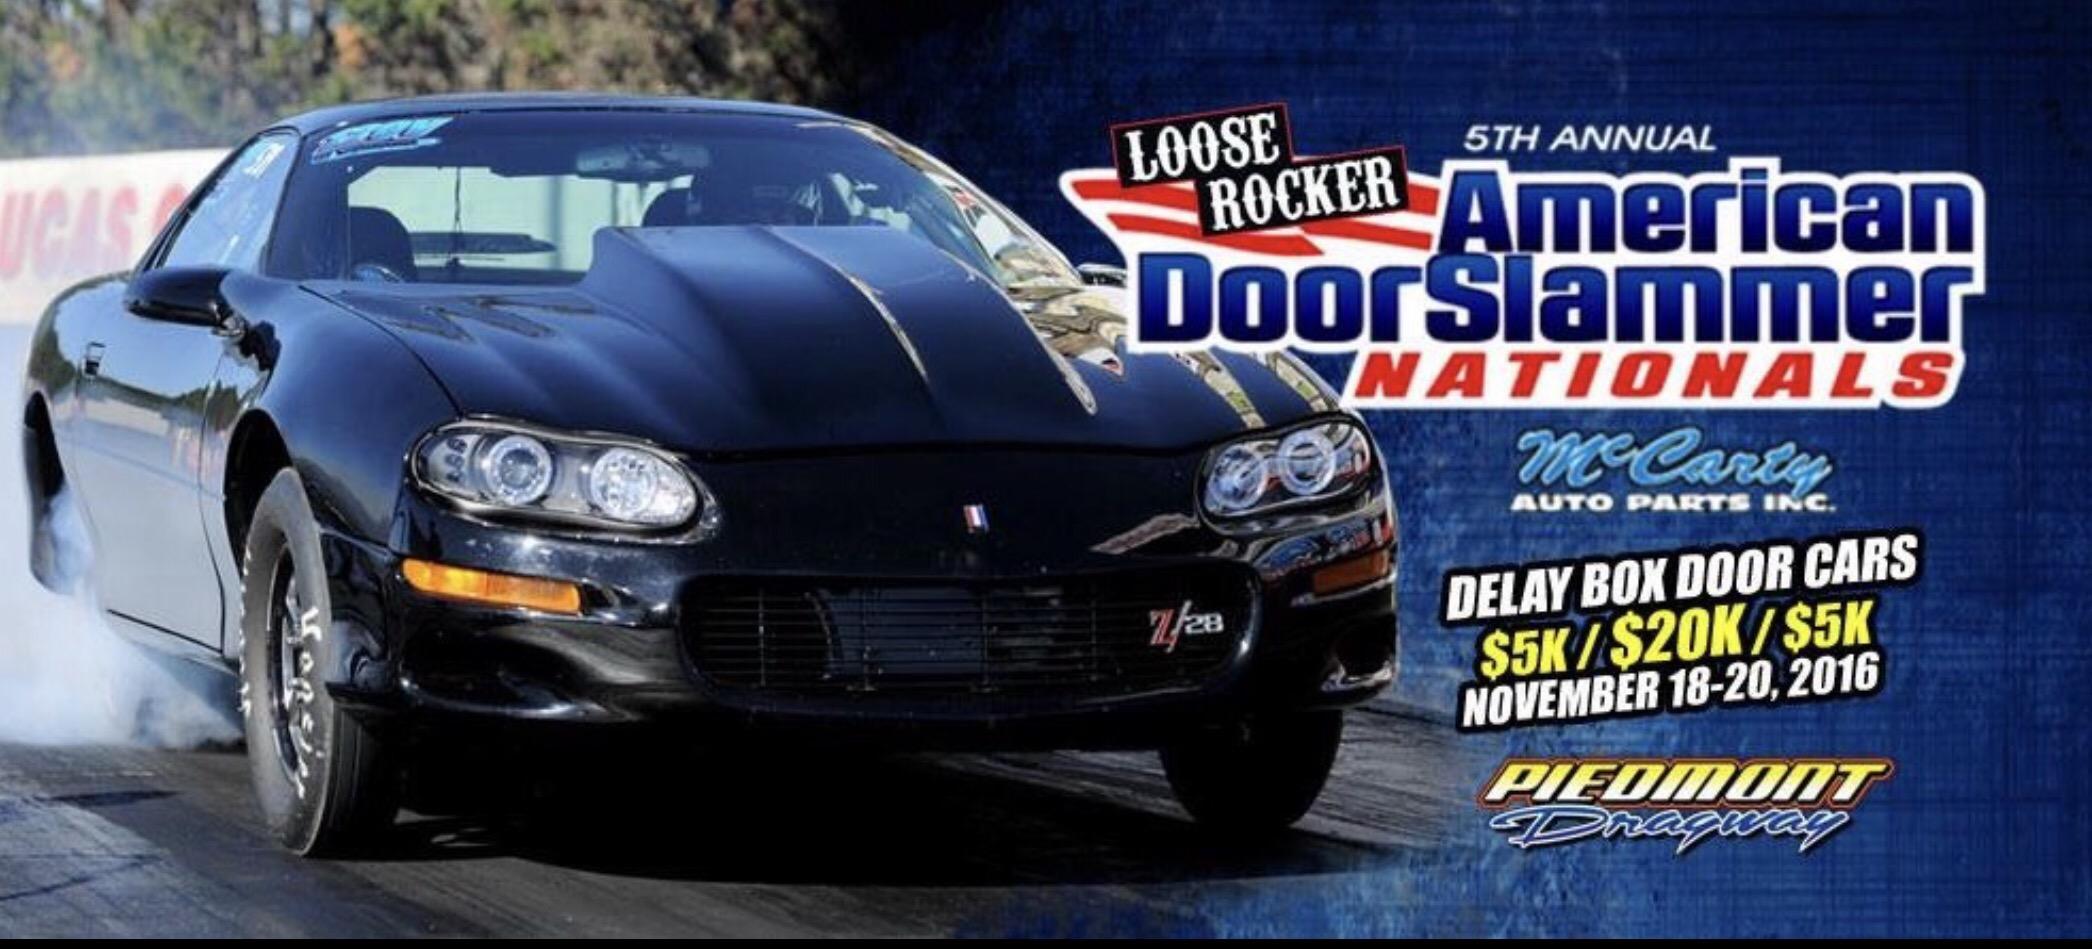 & LIVE FEED: American Door Slammer Nationals at Piedmont Dragway